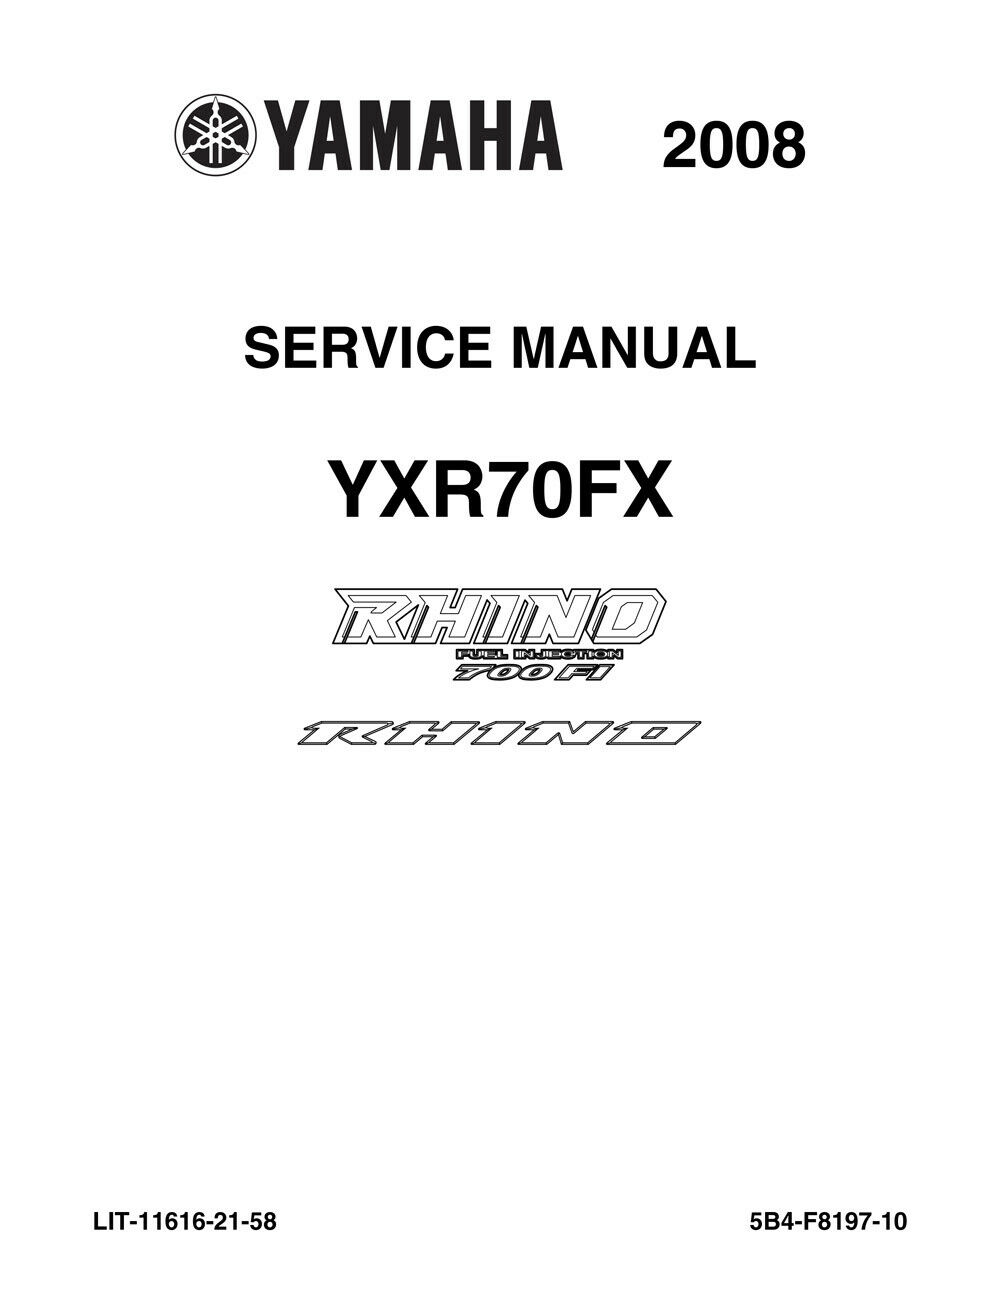 oem yamaha service manual 08 rhino 700 fi yxr70fx nos ebay rh ebay com rhino 660 service manual rhino 660 service manual